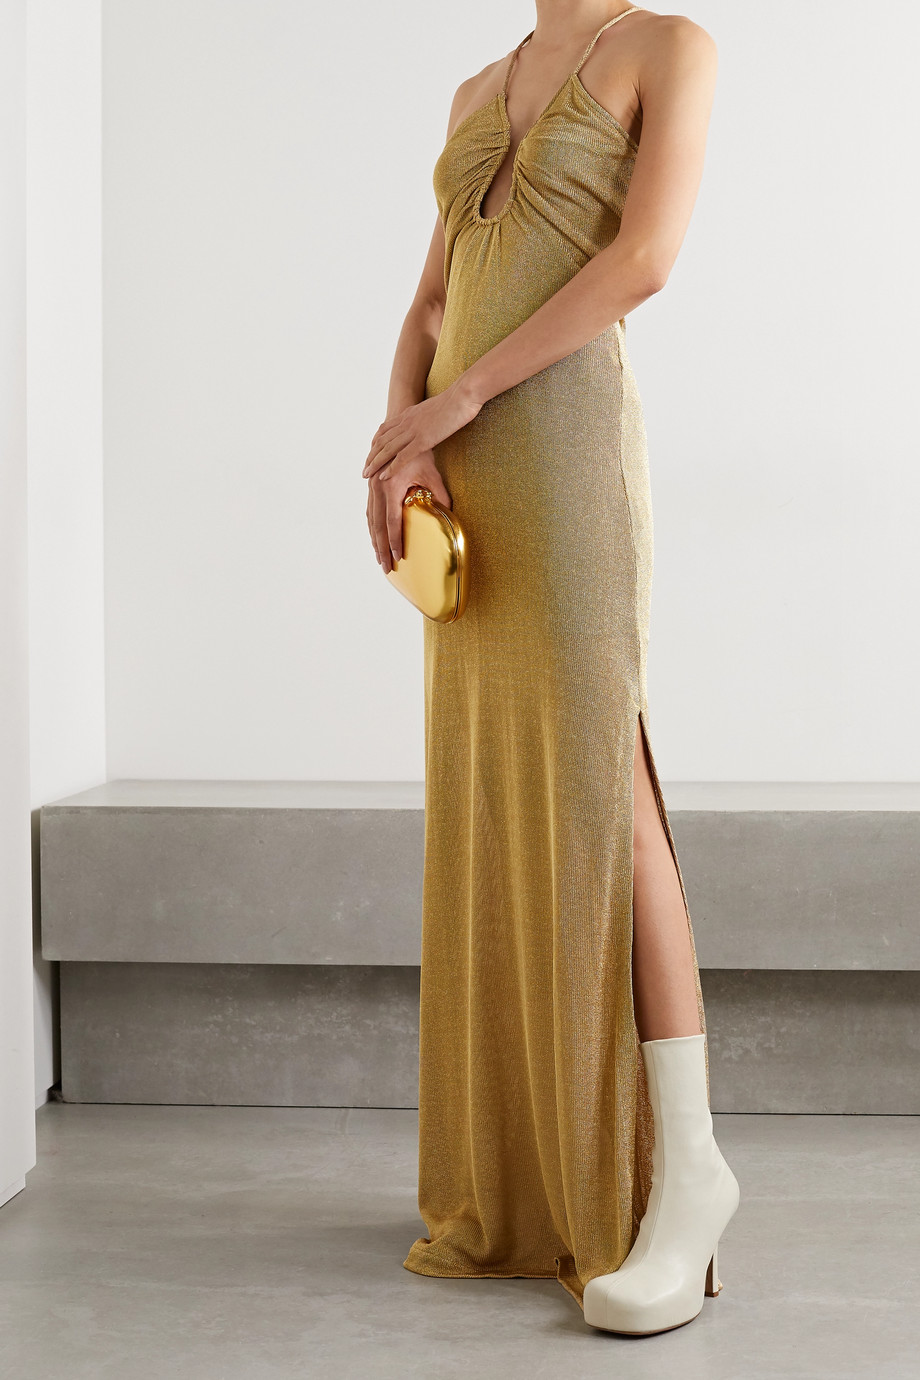 Fendi Open-back metallic knitted gown